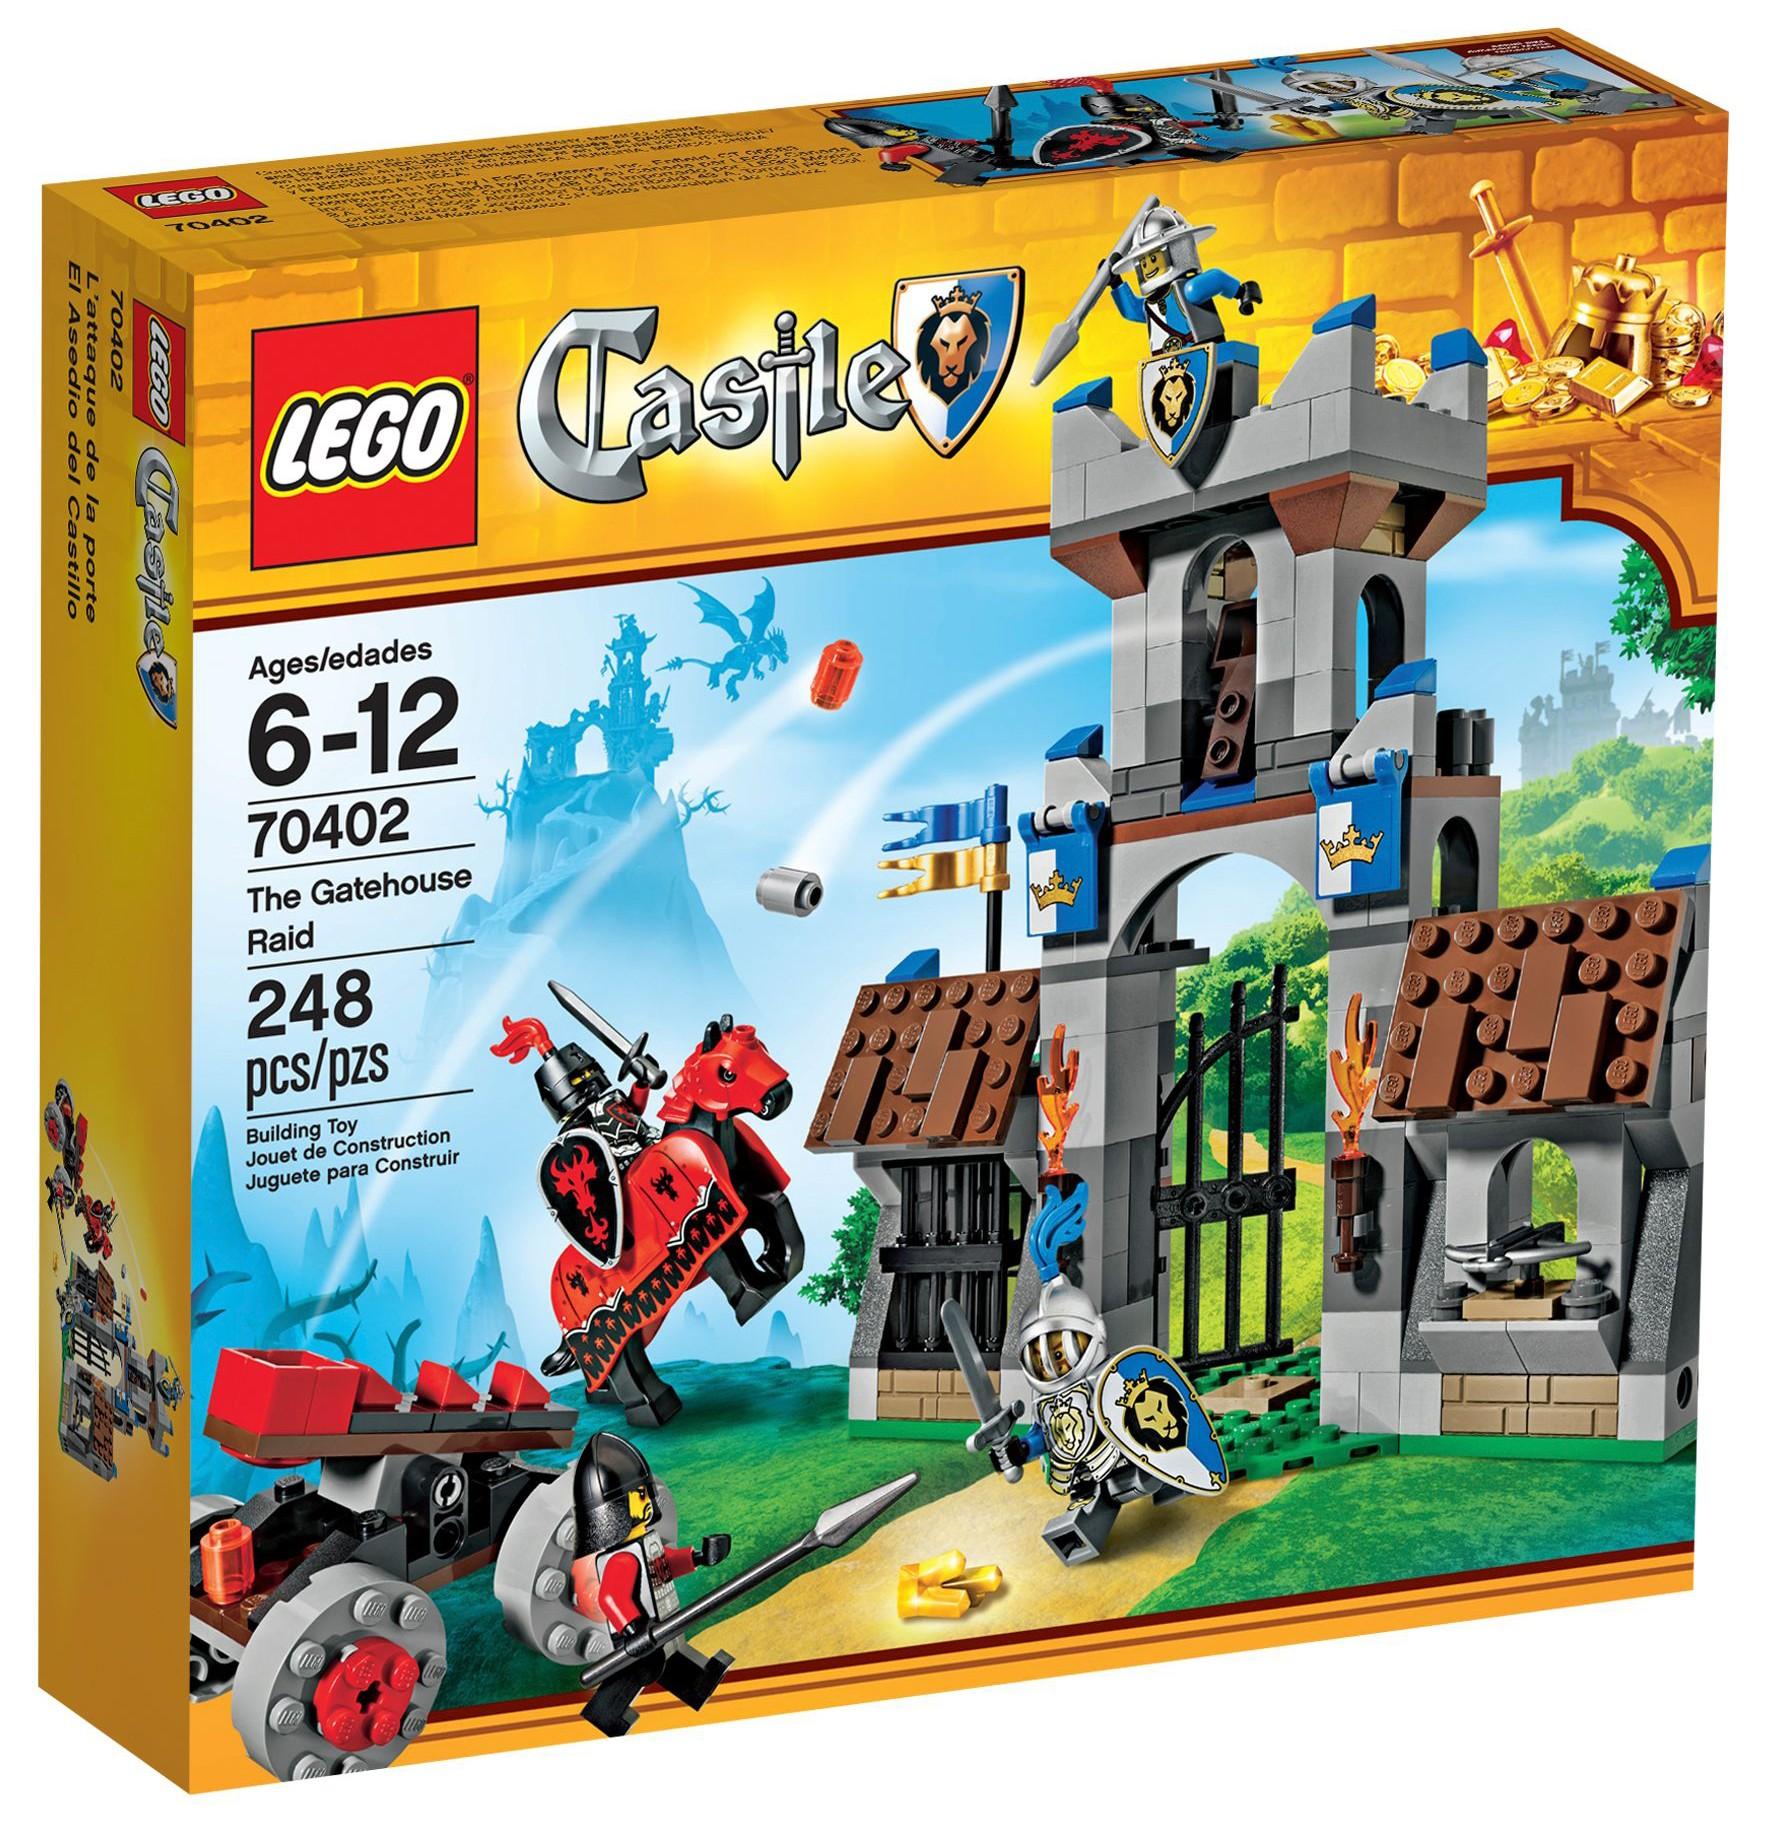 Lego Castle 2013 Summer Sets Photos Preview Bricks And Bloks